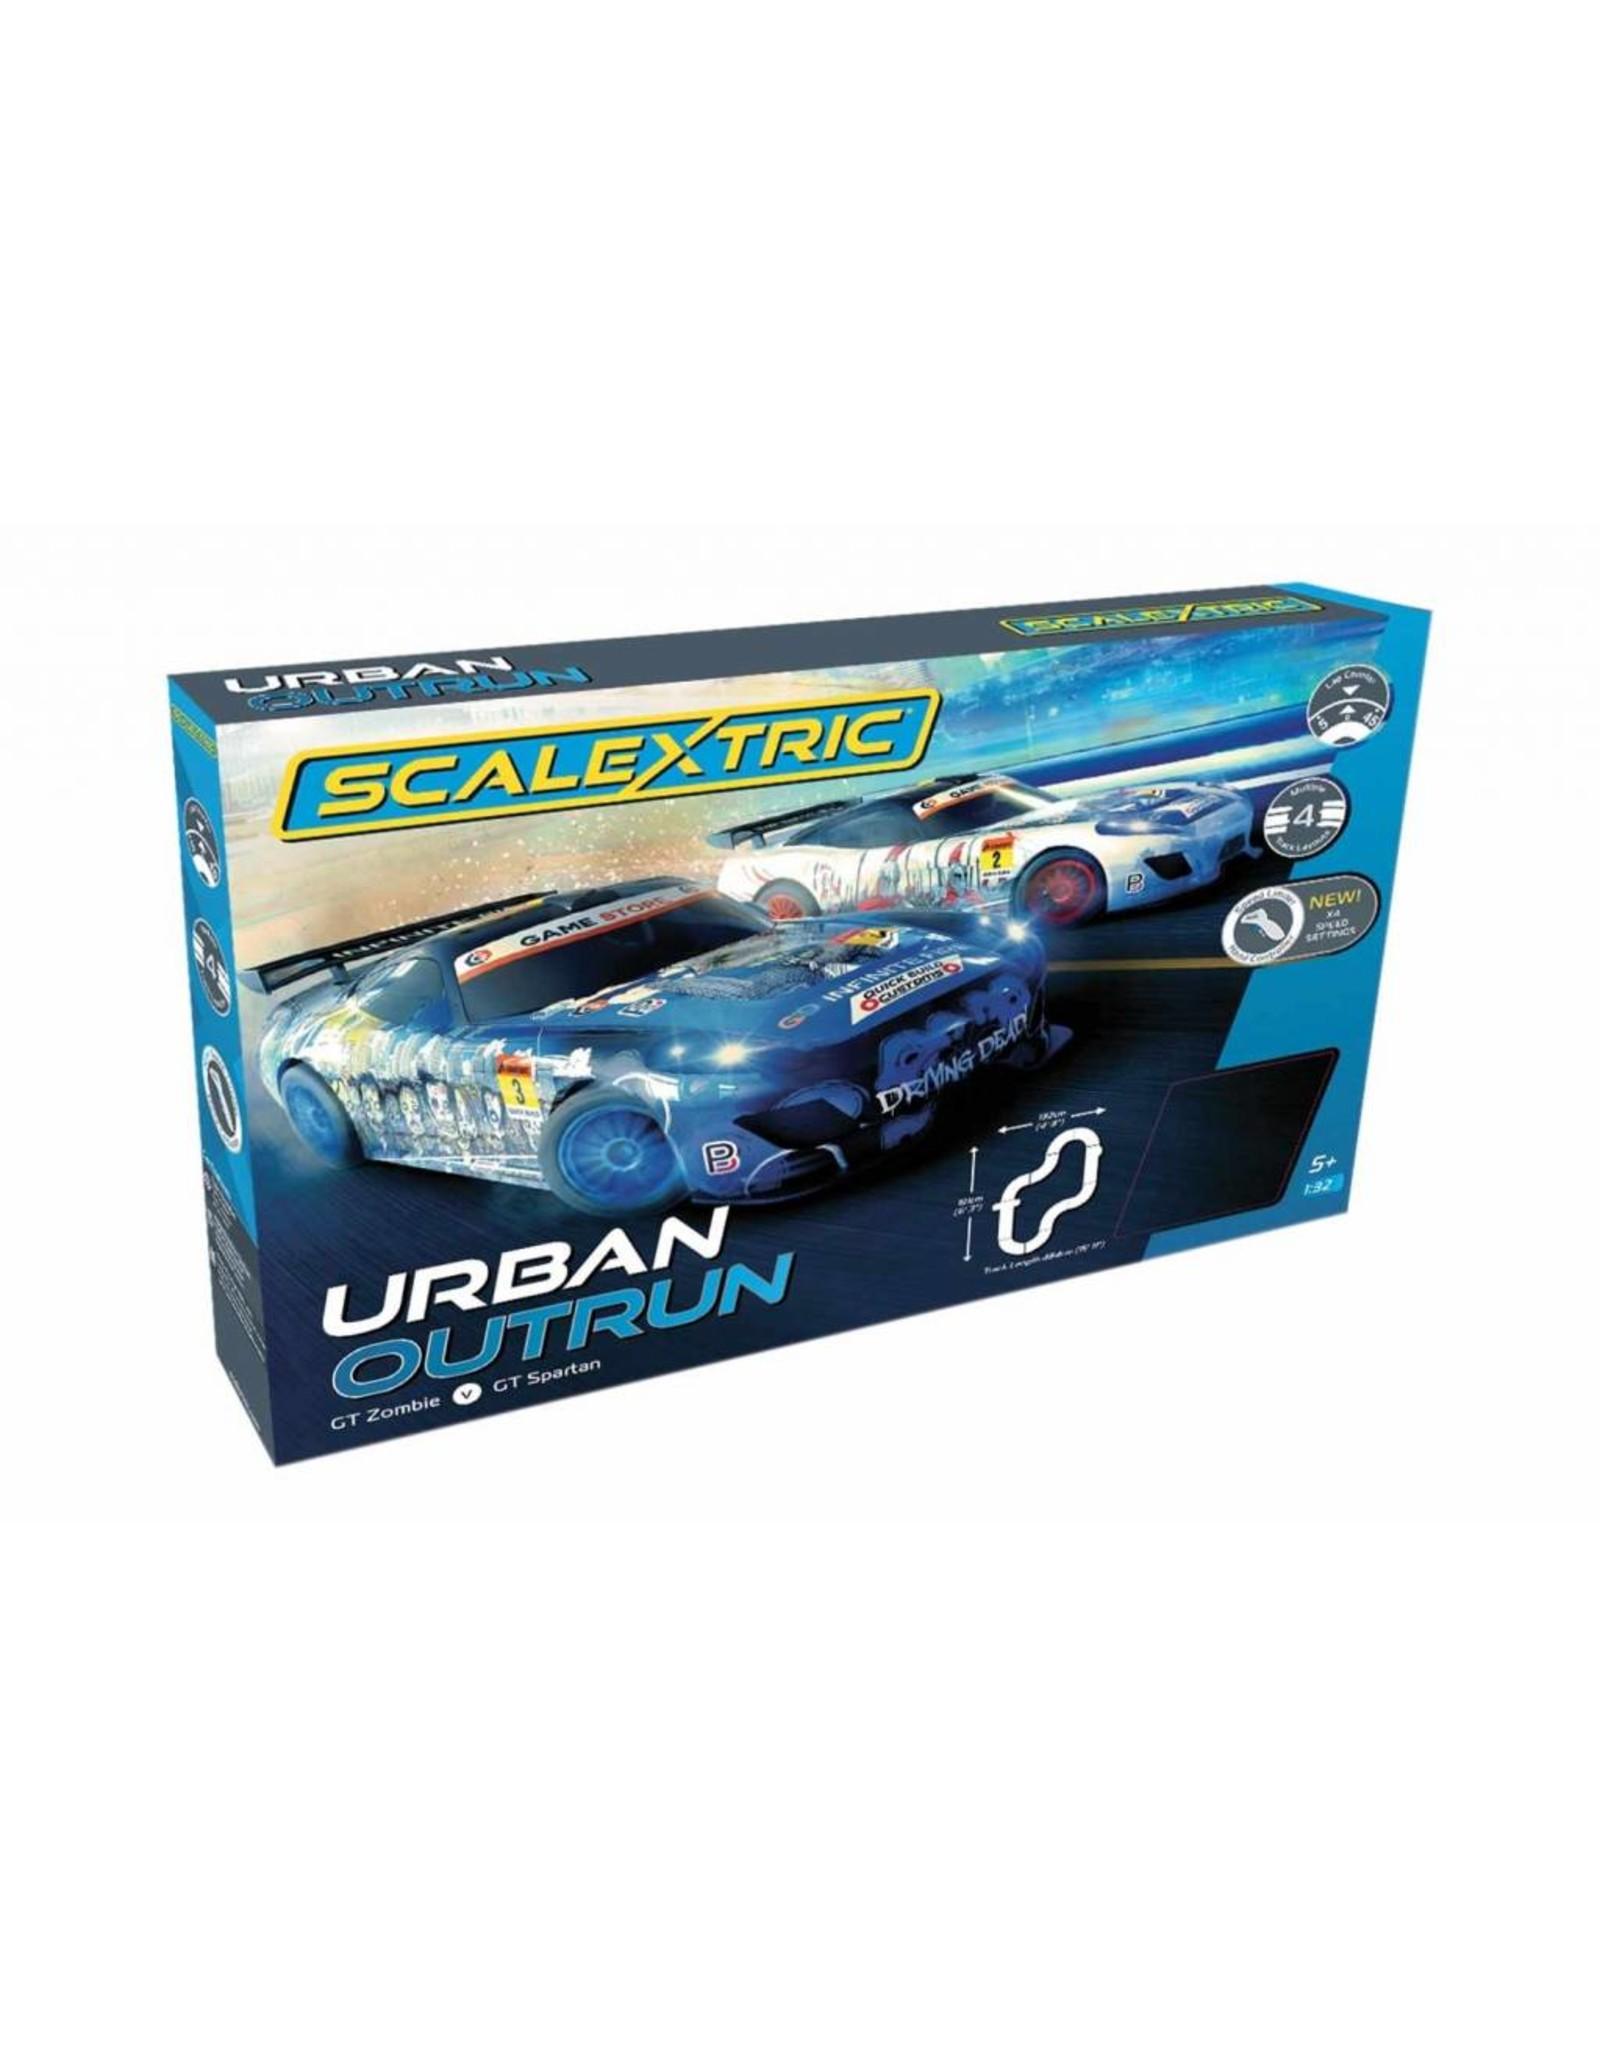 Scalextric Urban Outrun - 1:32 - Scalextric